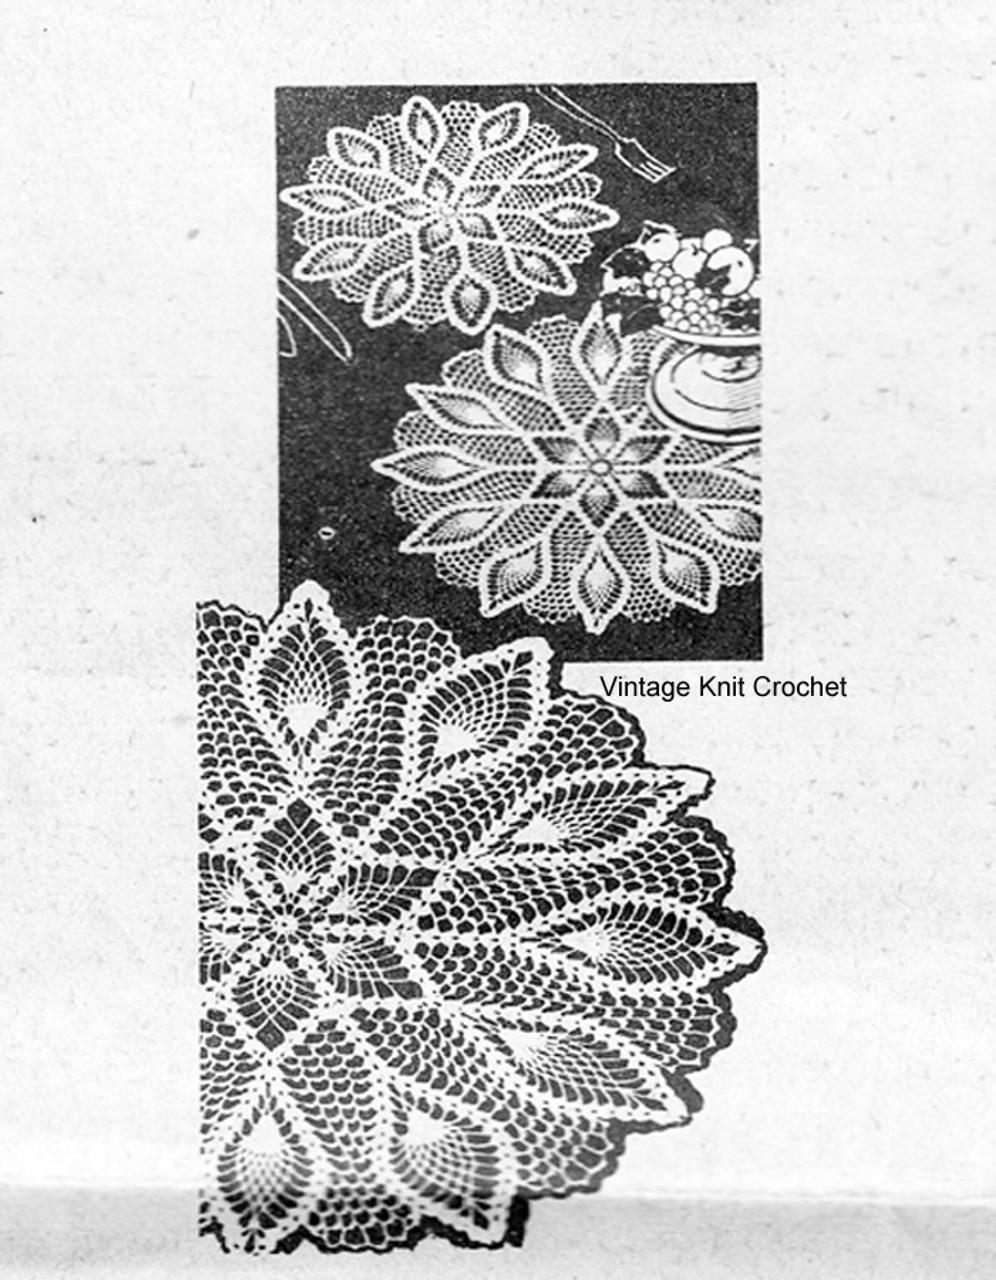 Vintage Pineapple Crochet Doilies Pattern Design 7136